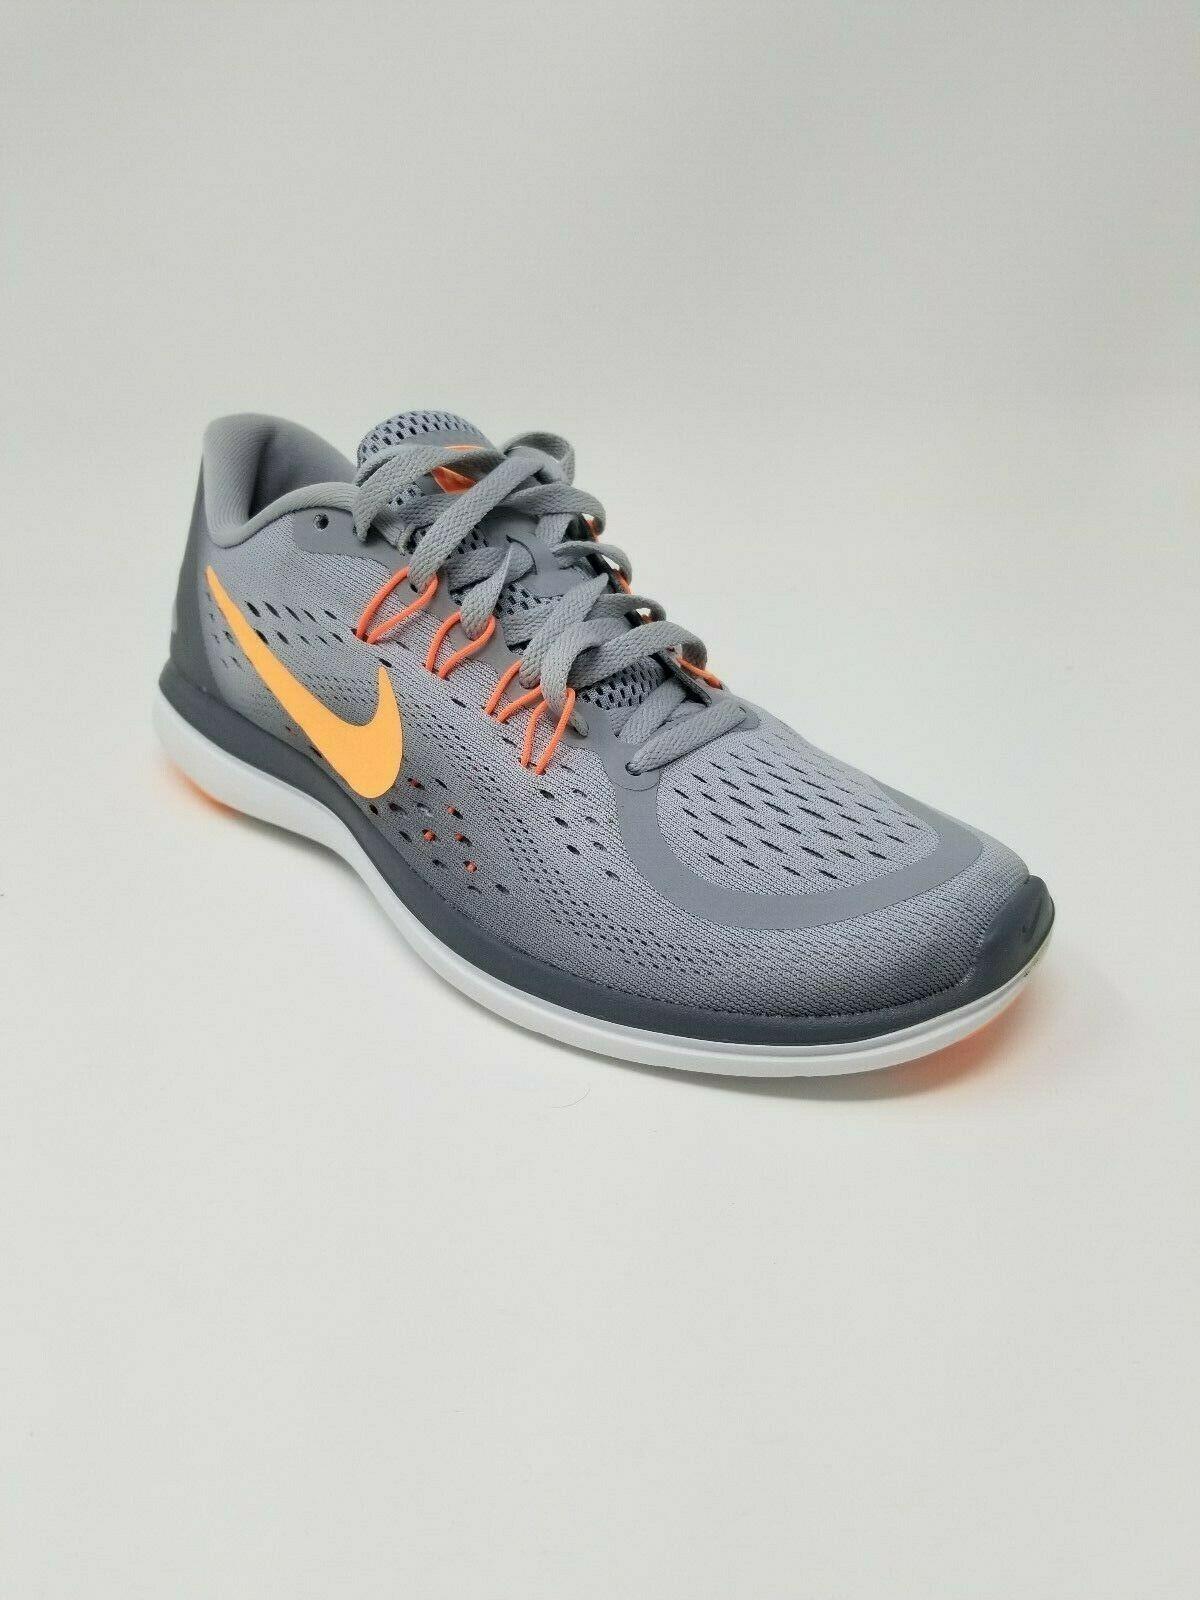 Puntuación Gladys Personas mayores  Pin on Nike Shoes for Women